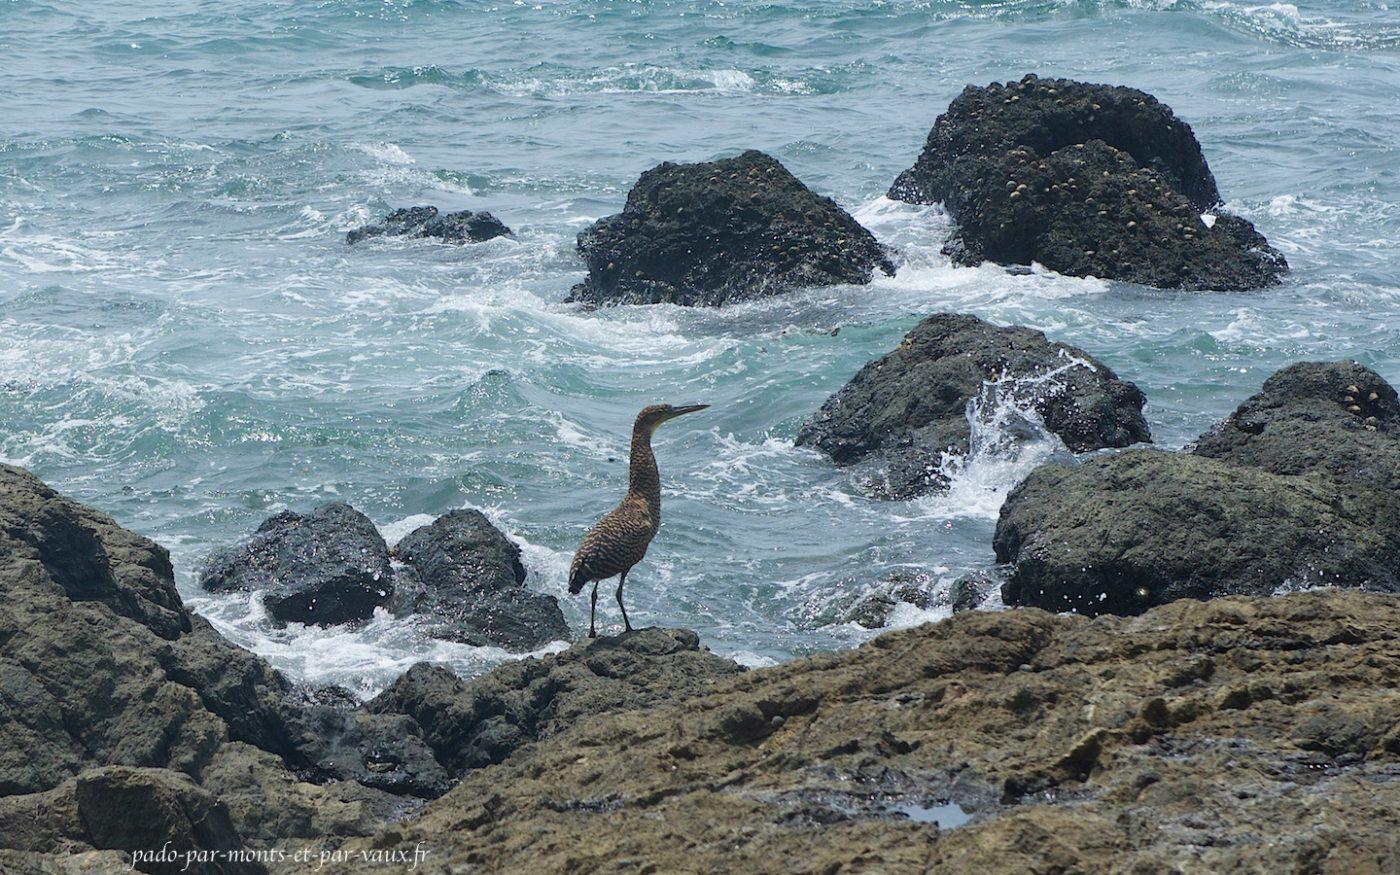 Costa Rica 2016 -Sirena a Carate -Oiseaux -Onore du Mexique juvenile